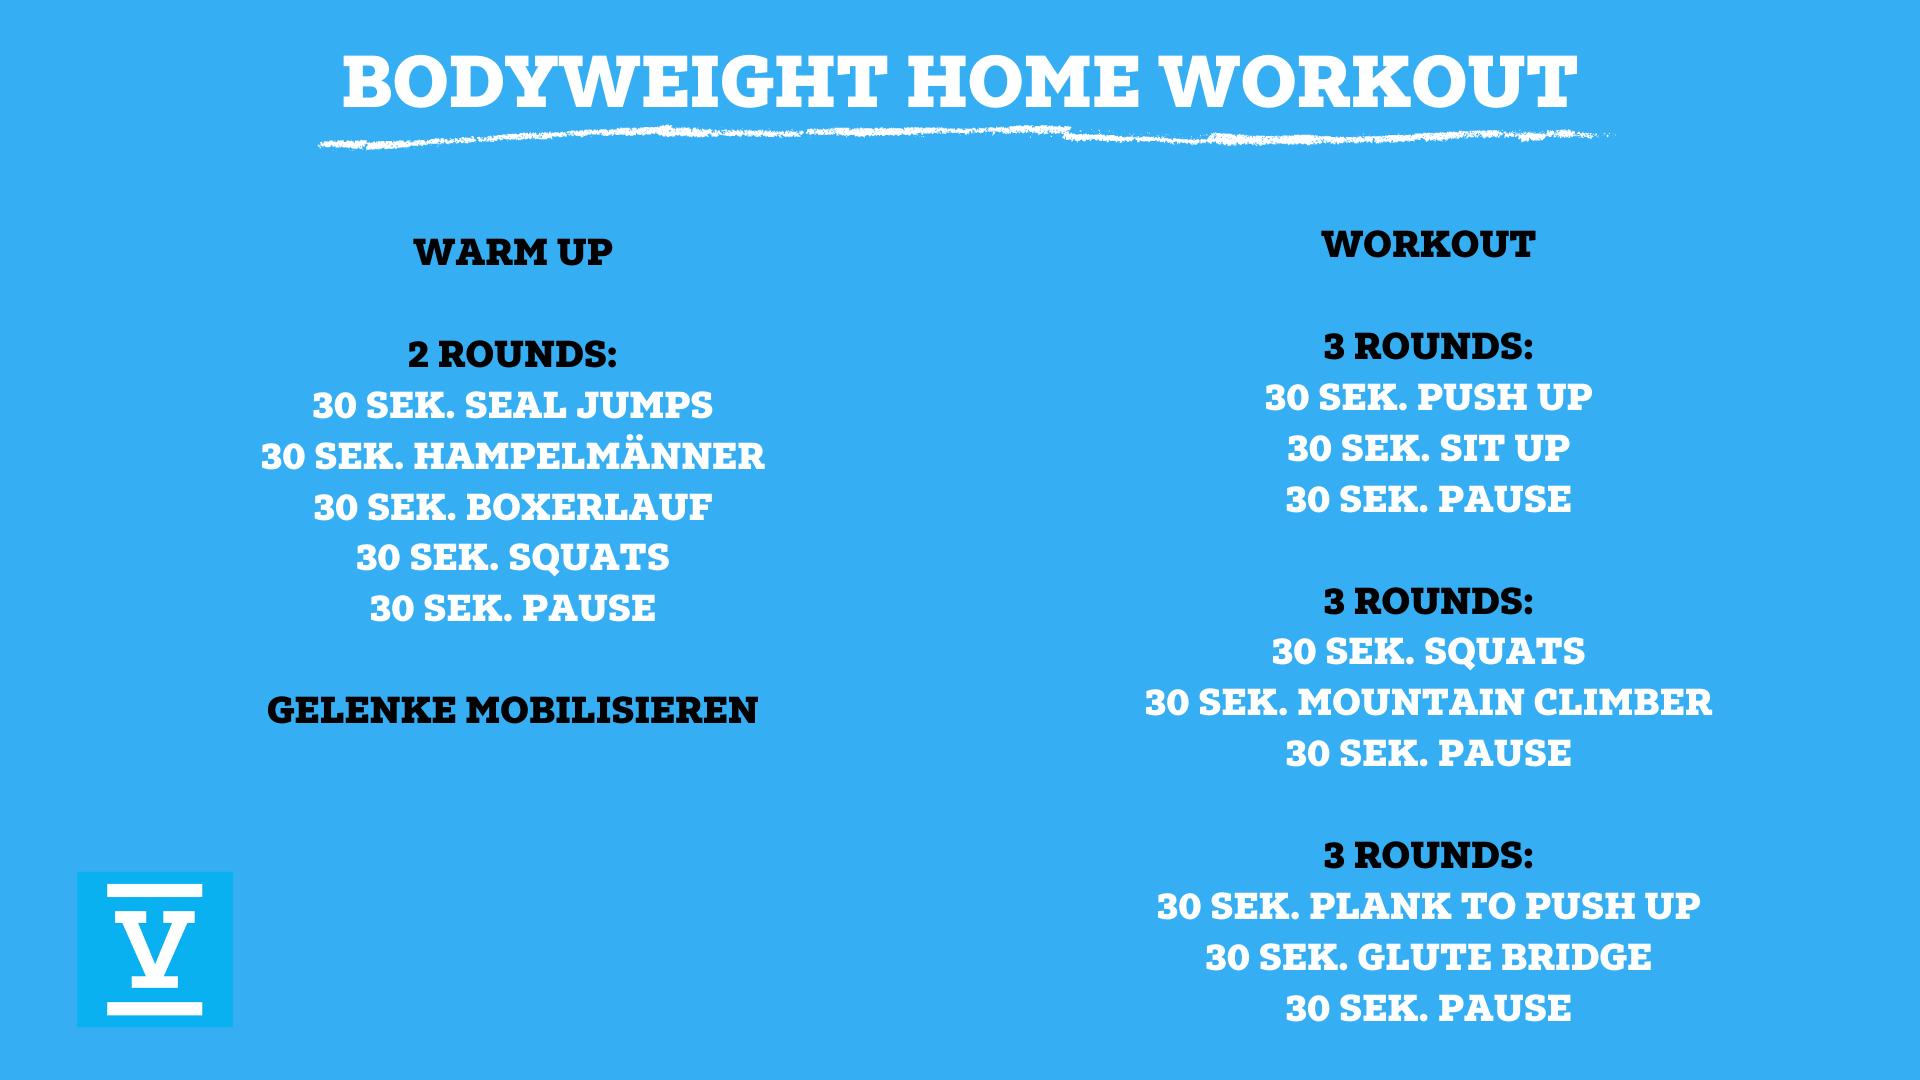 Bodyweight Home Workout